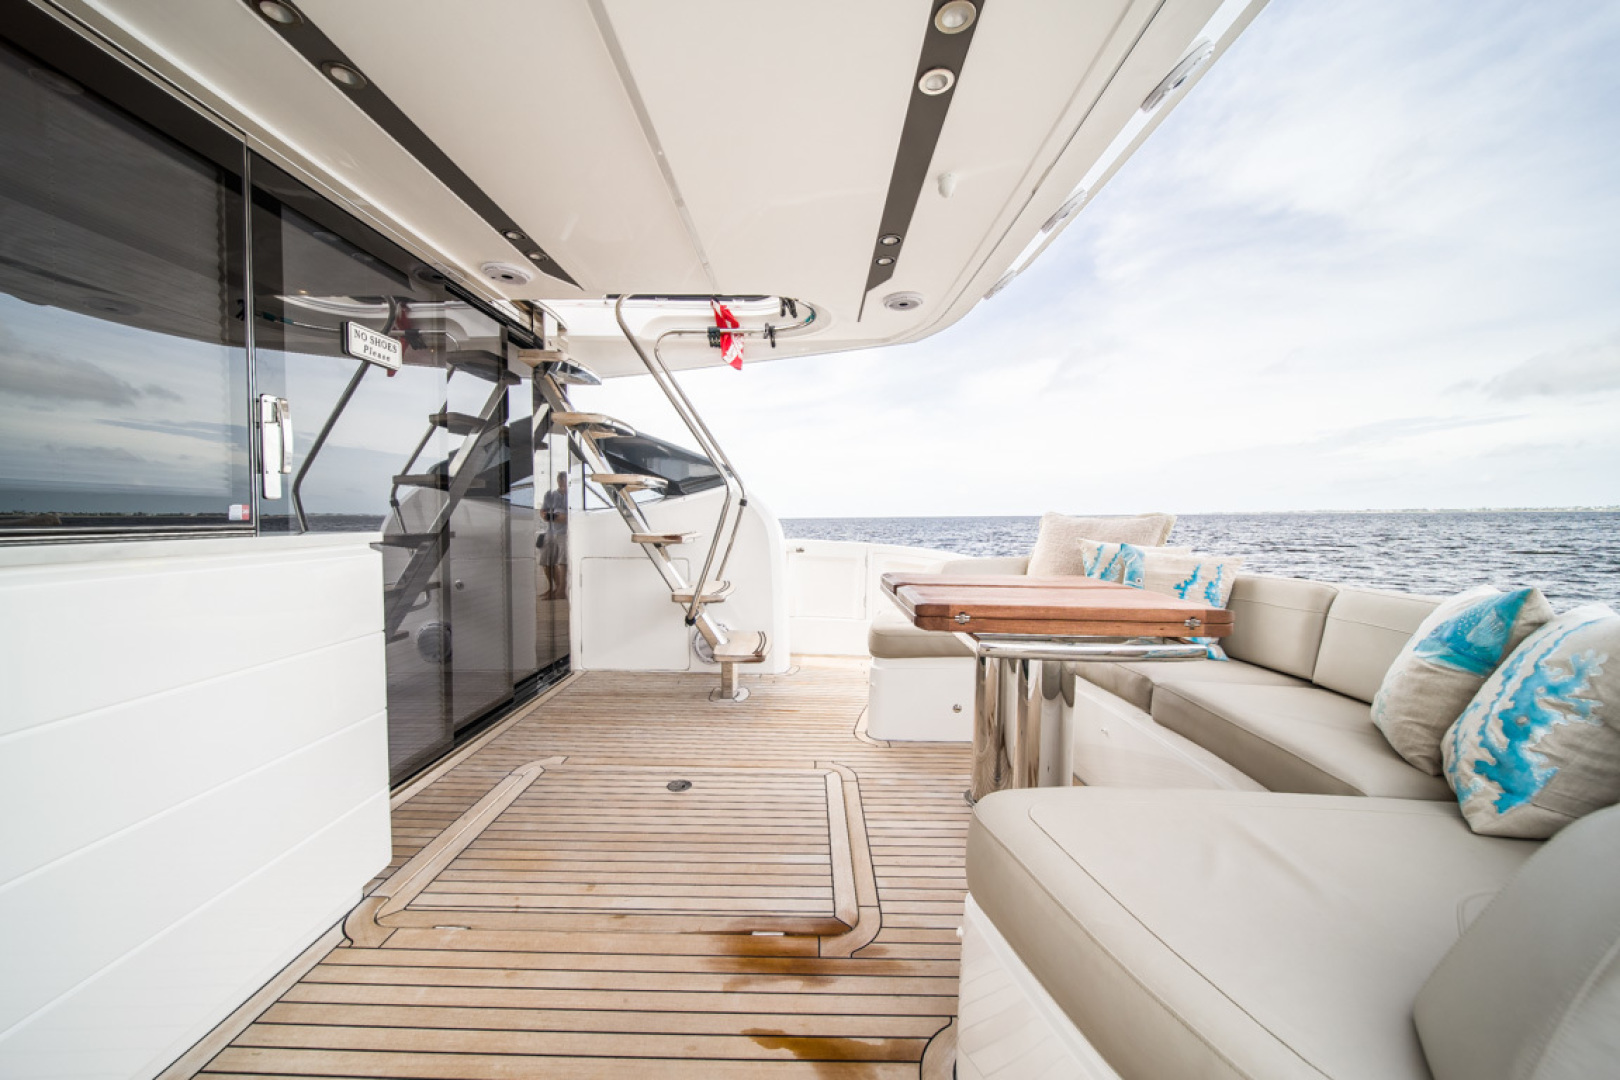 Princess-S65 2019-Paragon Cape Coral-Florida-United States-2019 65 Princess S65-Paragon-Cockpit-1510251 | Thumbnail